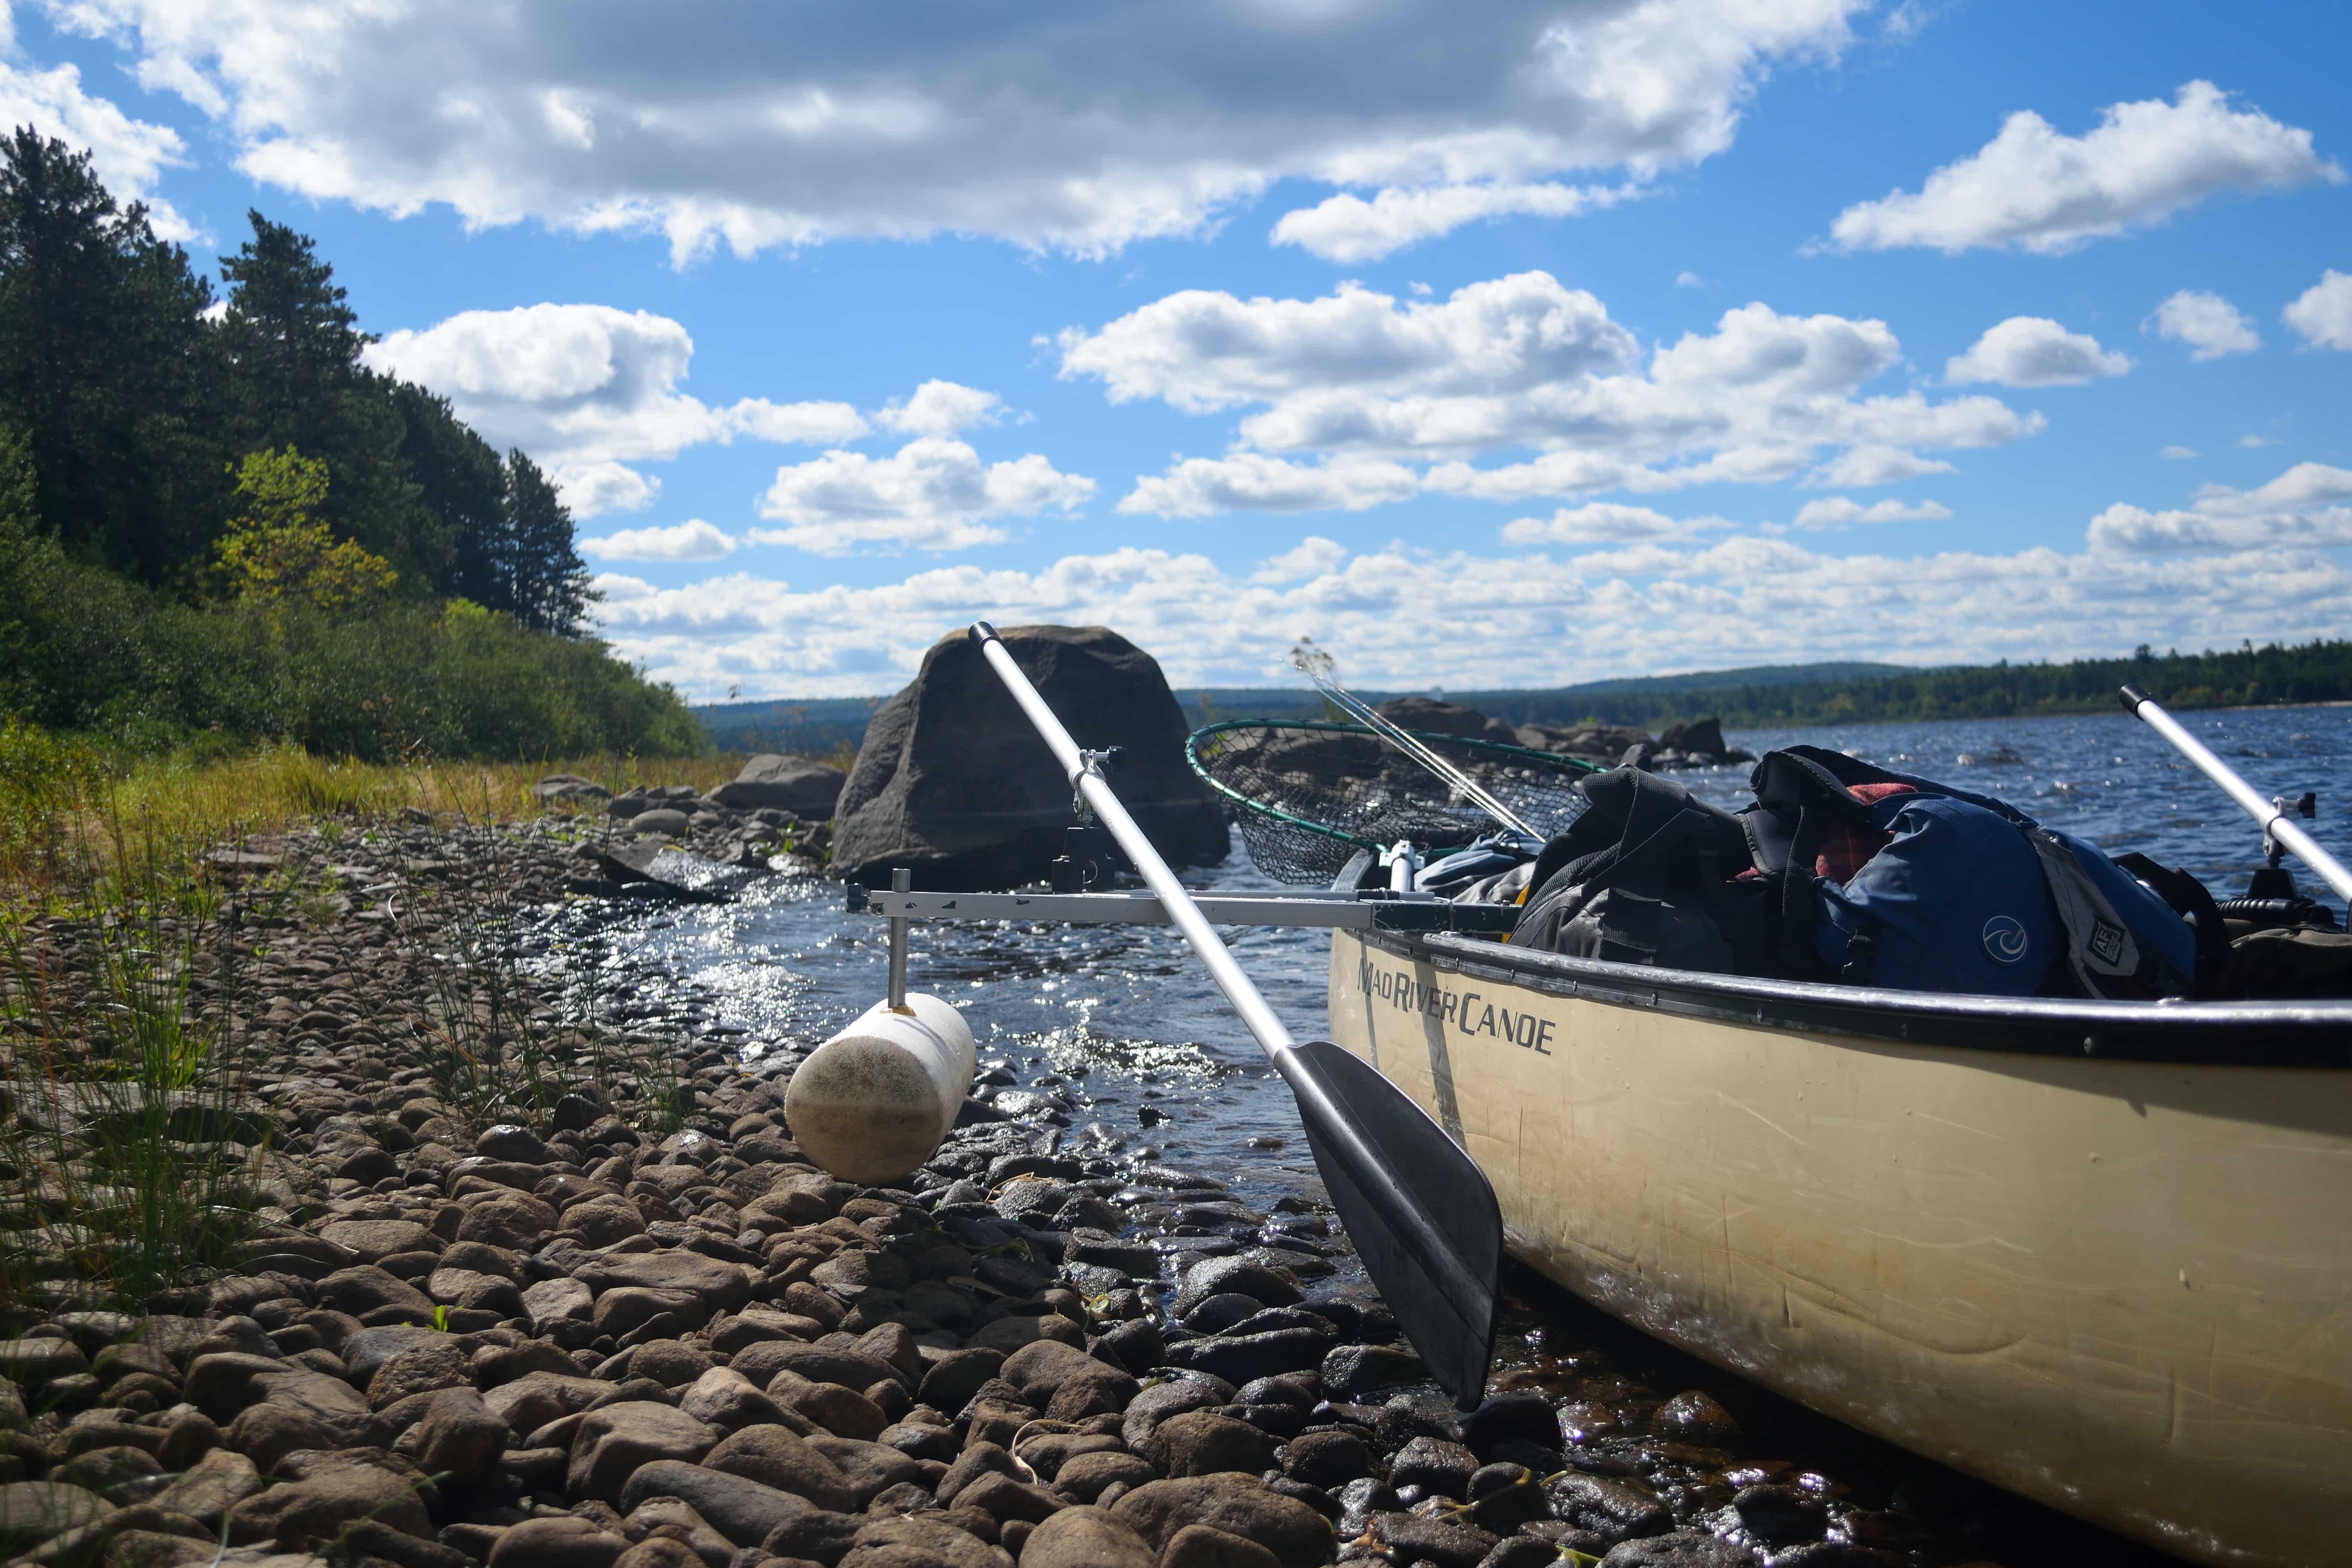 Short bank break. Take note of the canoe set up